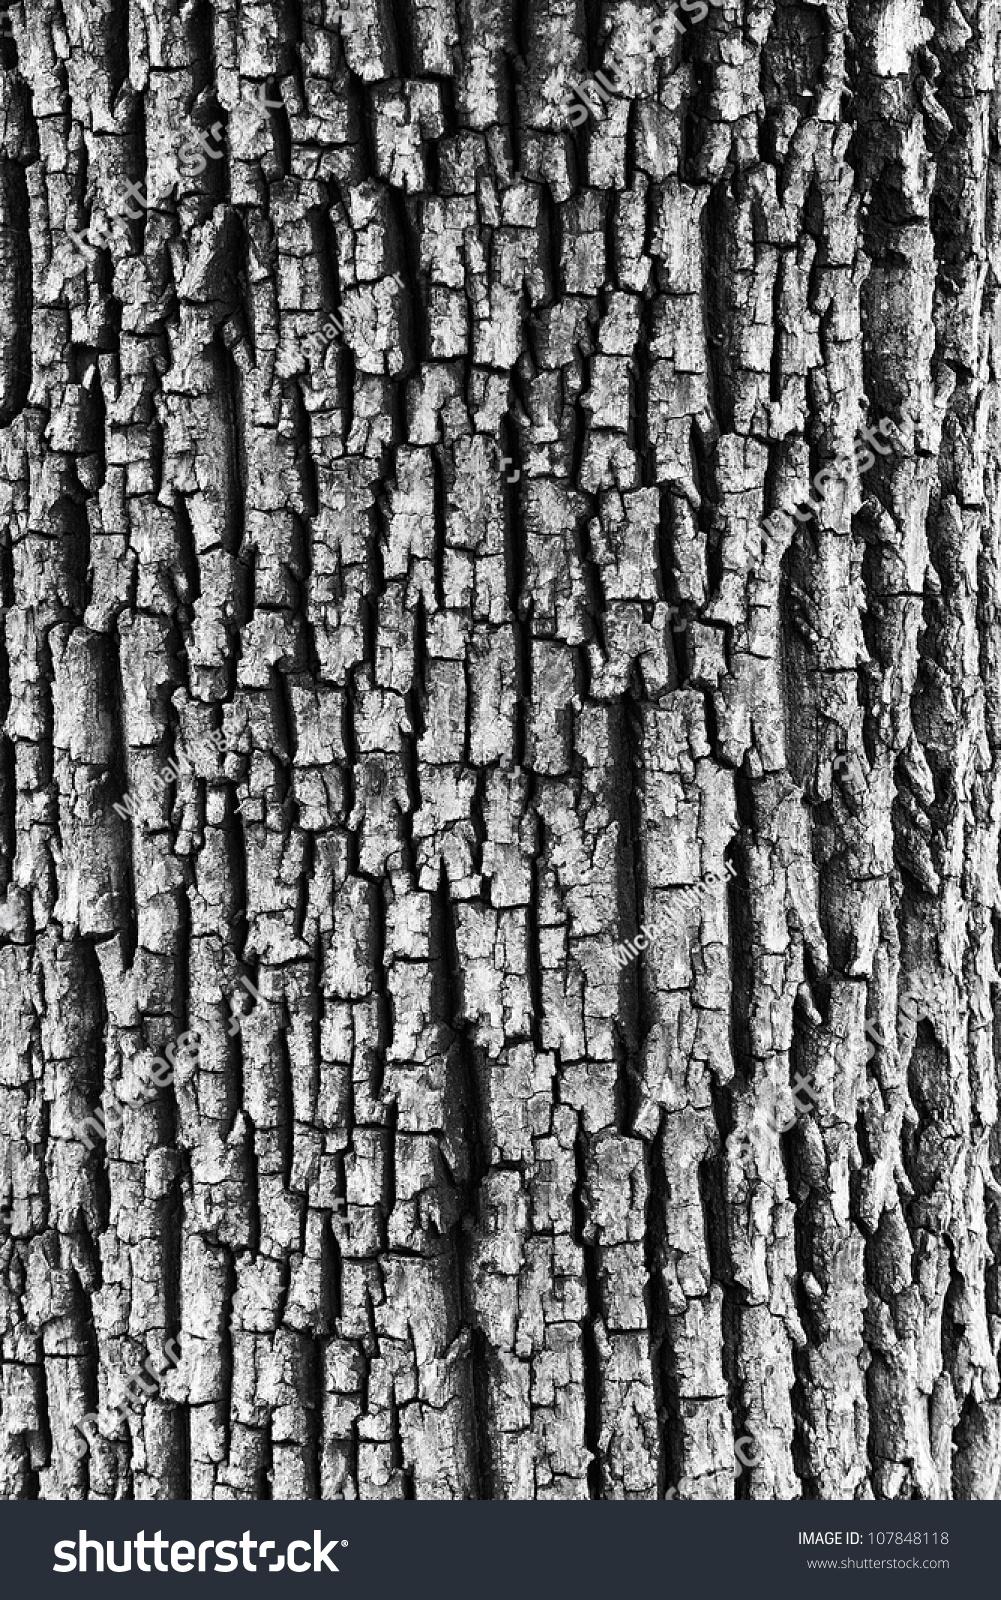 Tree Bark Clipart Black And White.